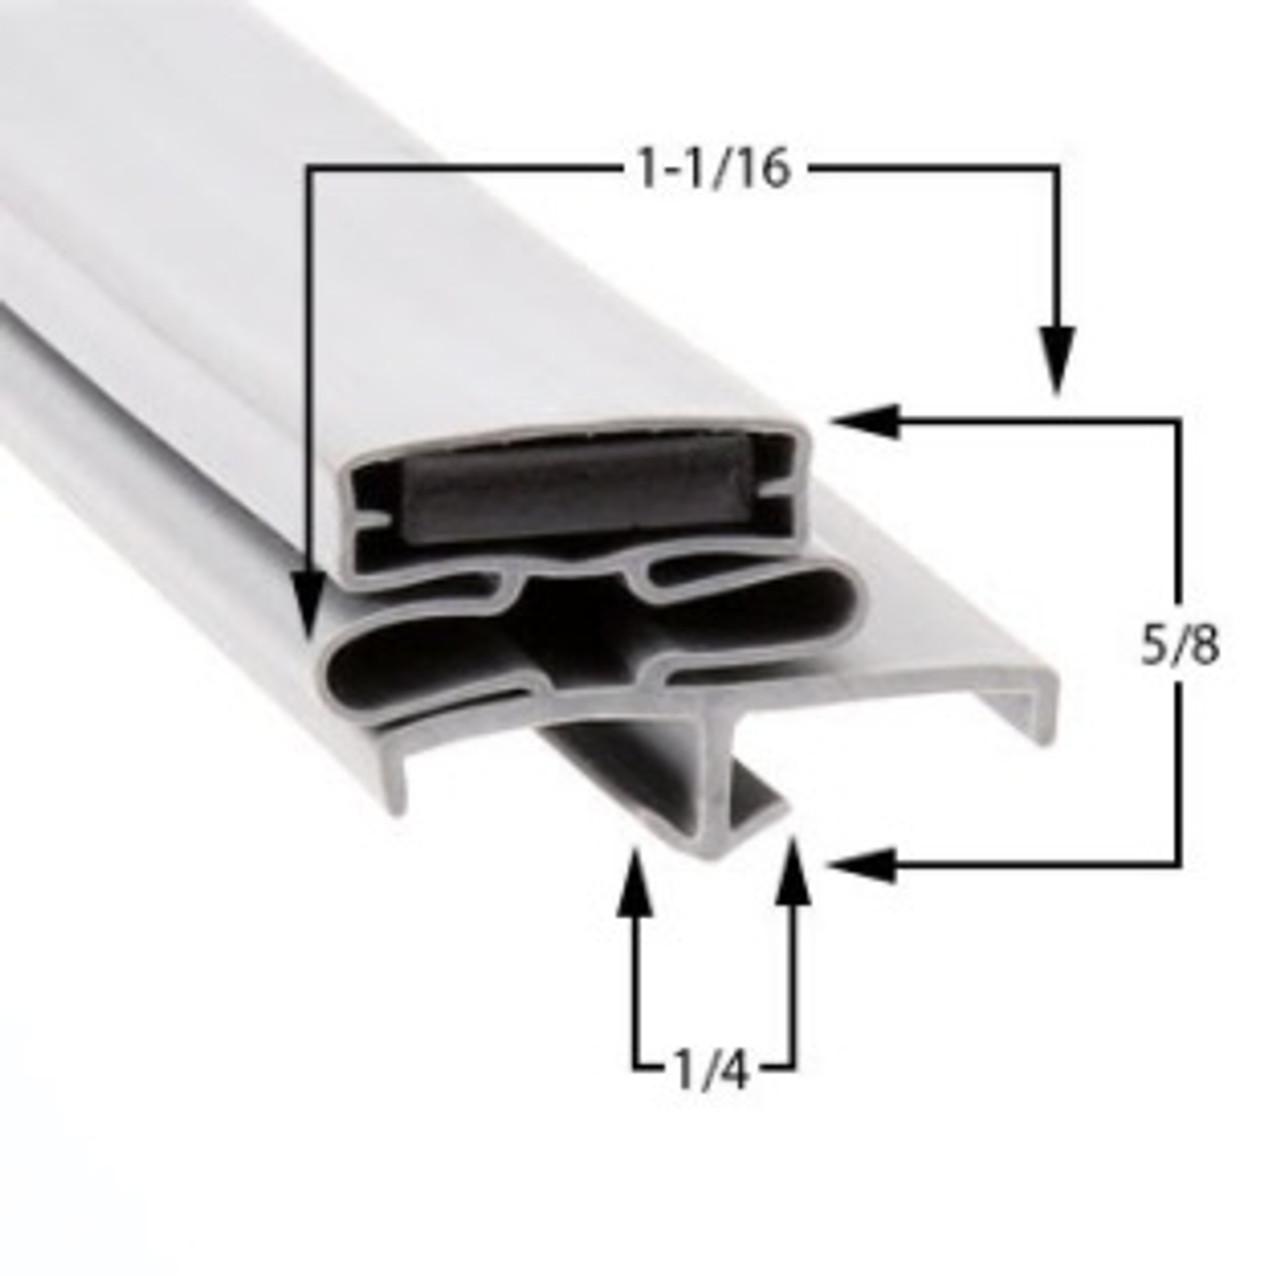 Delfield Door Gasket Profile 168 20 1/2 x 29 -A2.0865, 1702262-2